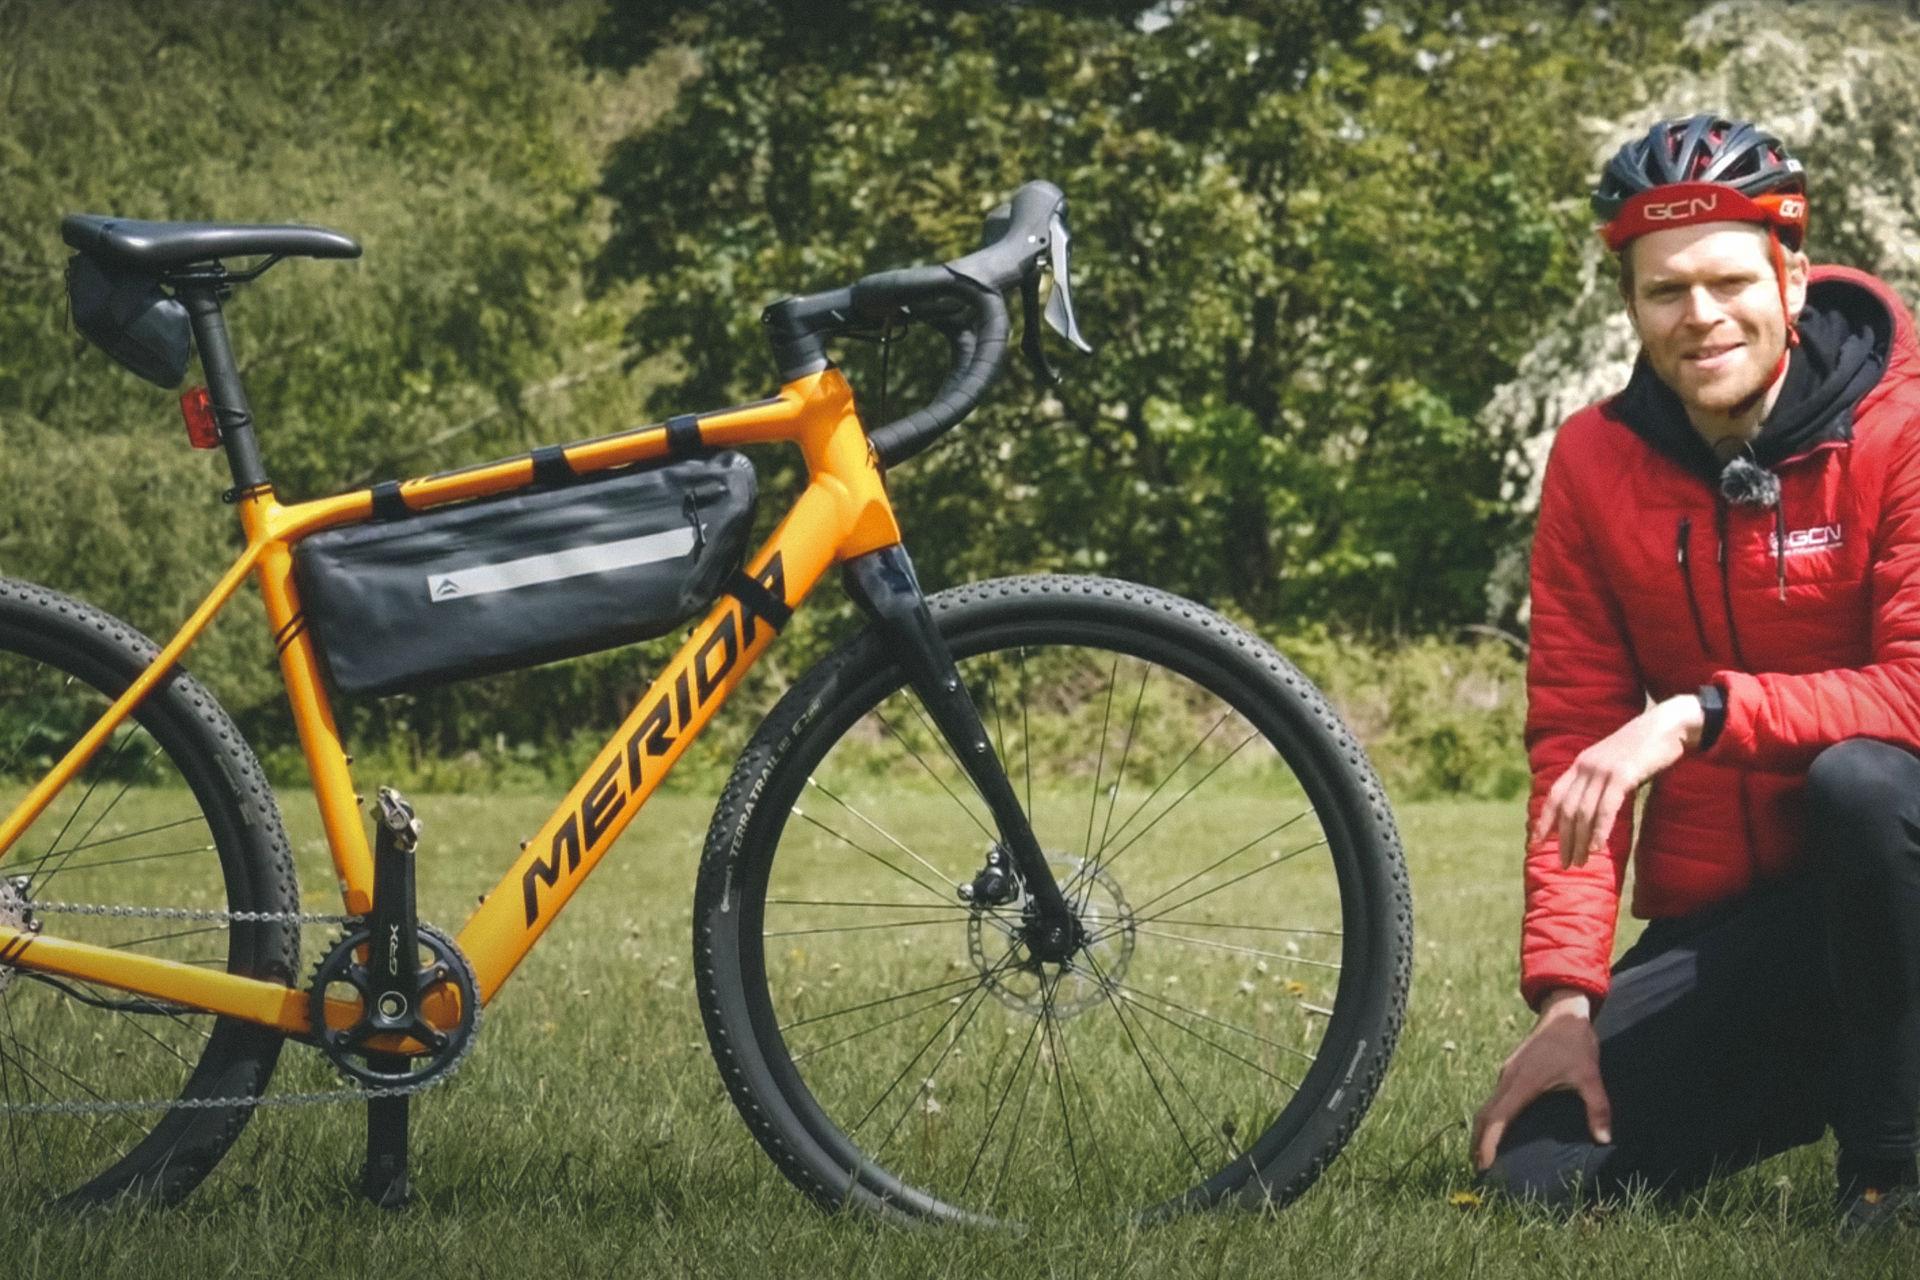 rower elektryczny, rowerem do pracy, Merida eSilex, eSilex, ebike, rower elektryczny Merida, rowery elektryczne Merida